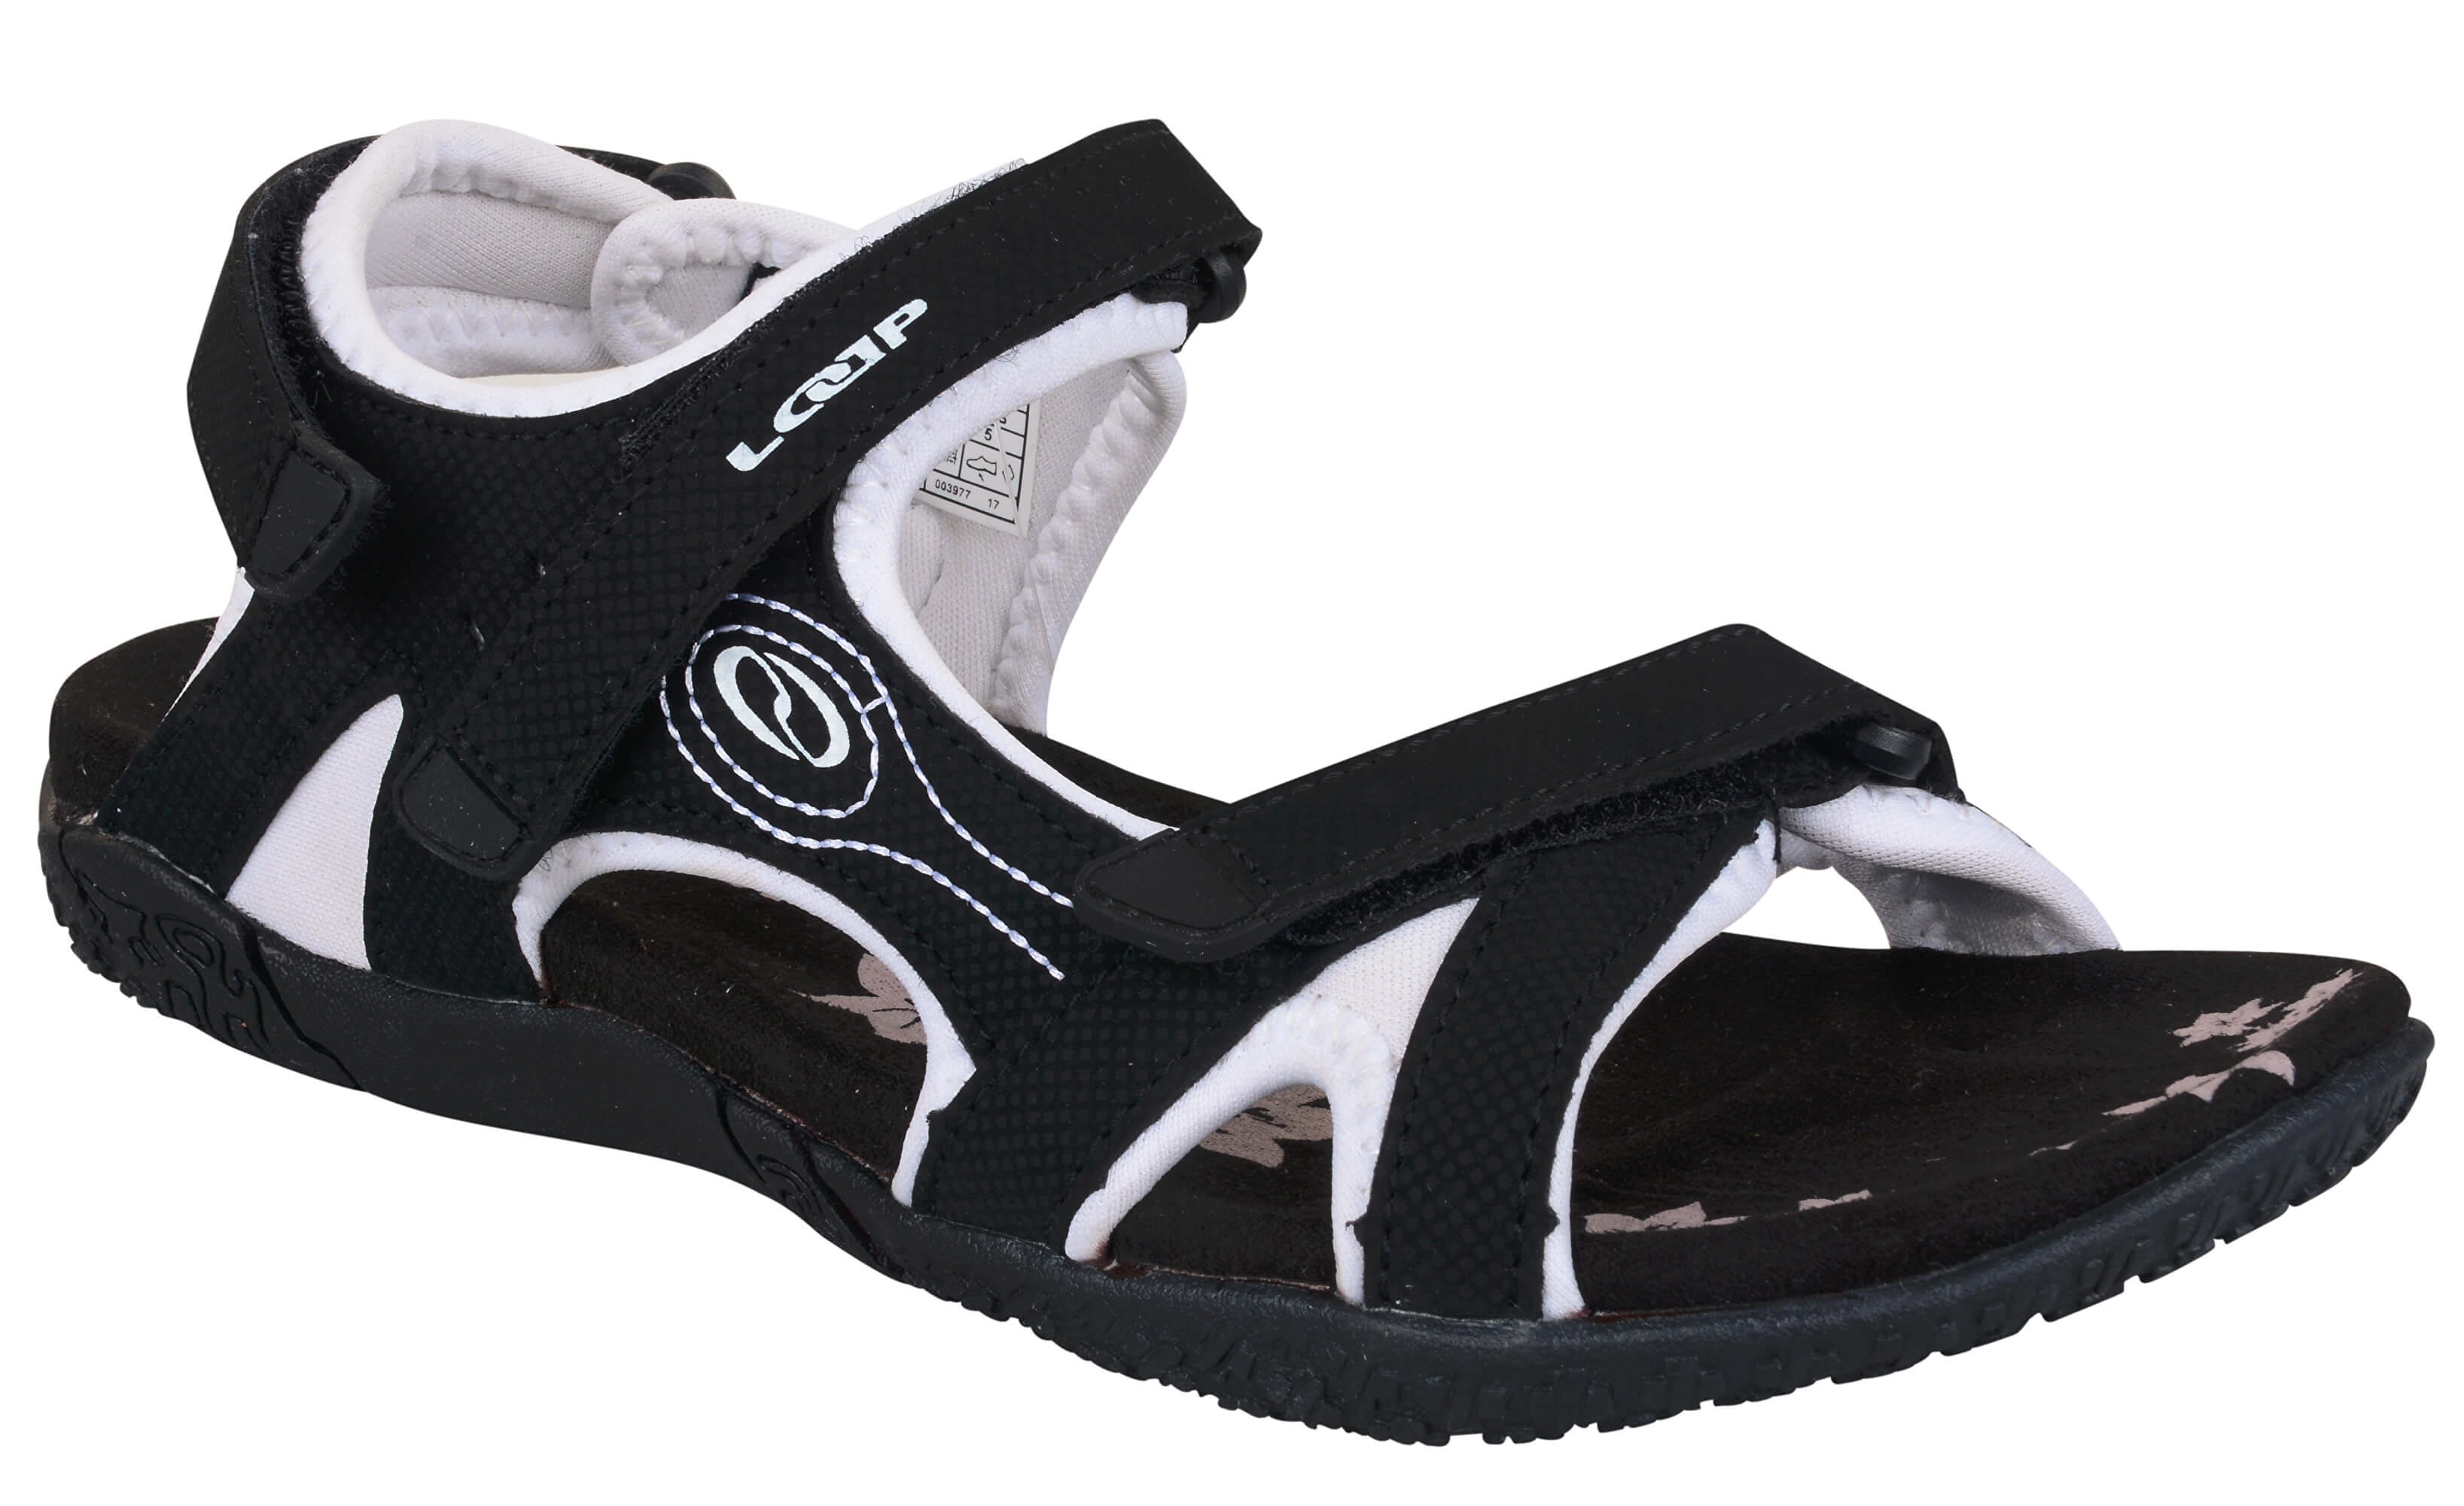 da9658630b5 LOAP Dámské sandály Caffa Black Bl de Blanc černo-bílé SSL1758-V11A ...